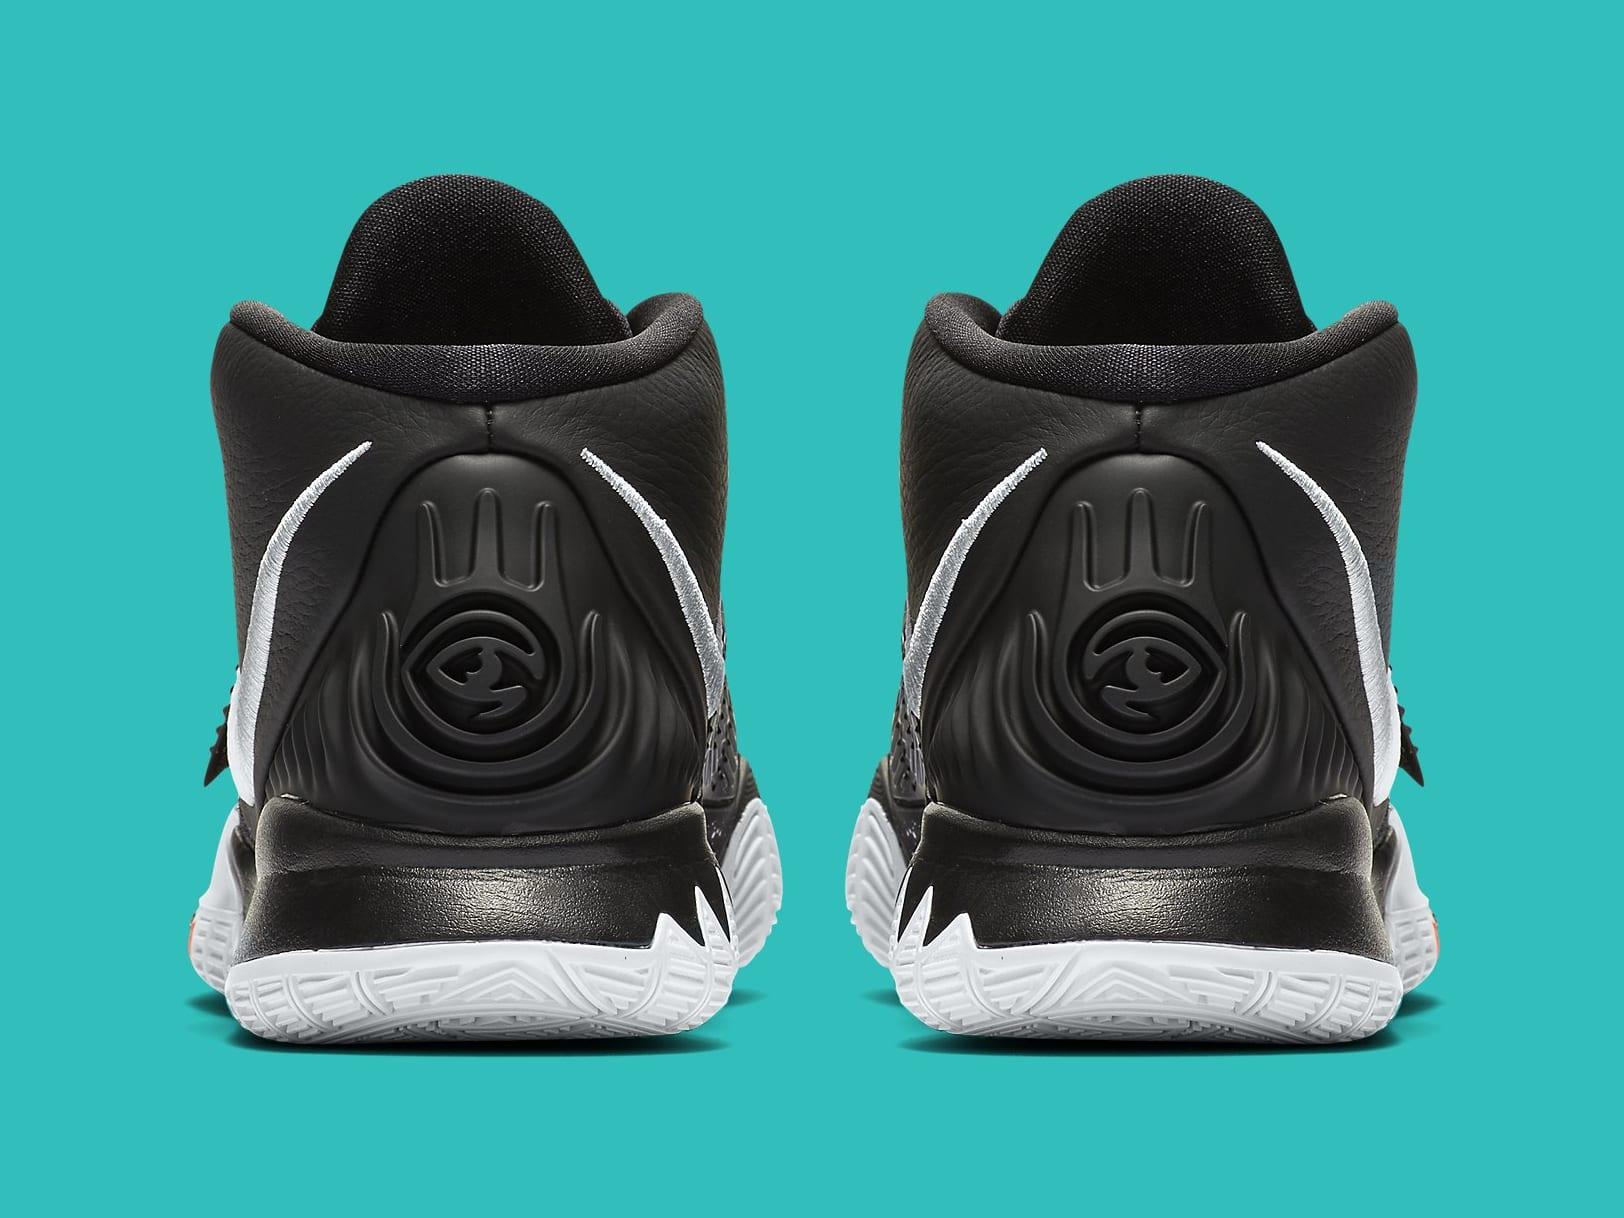 Nike Kyrie 6 Black White Release Date BQ4630-001 Heel